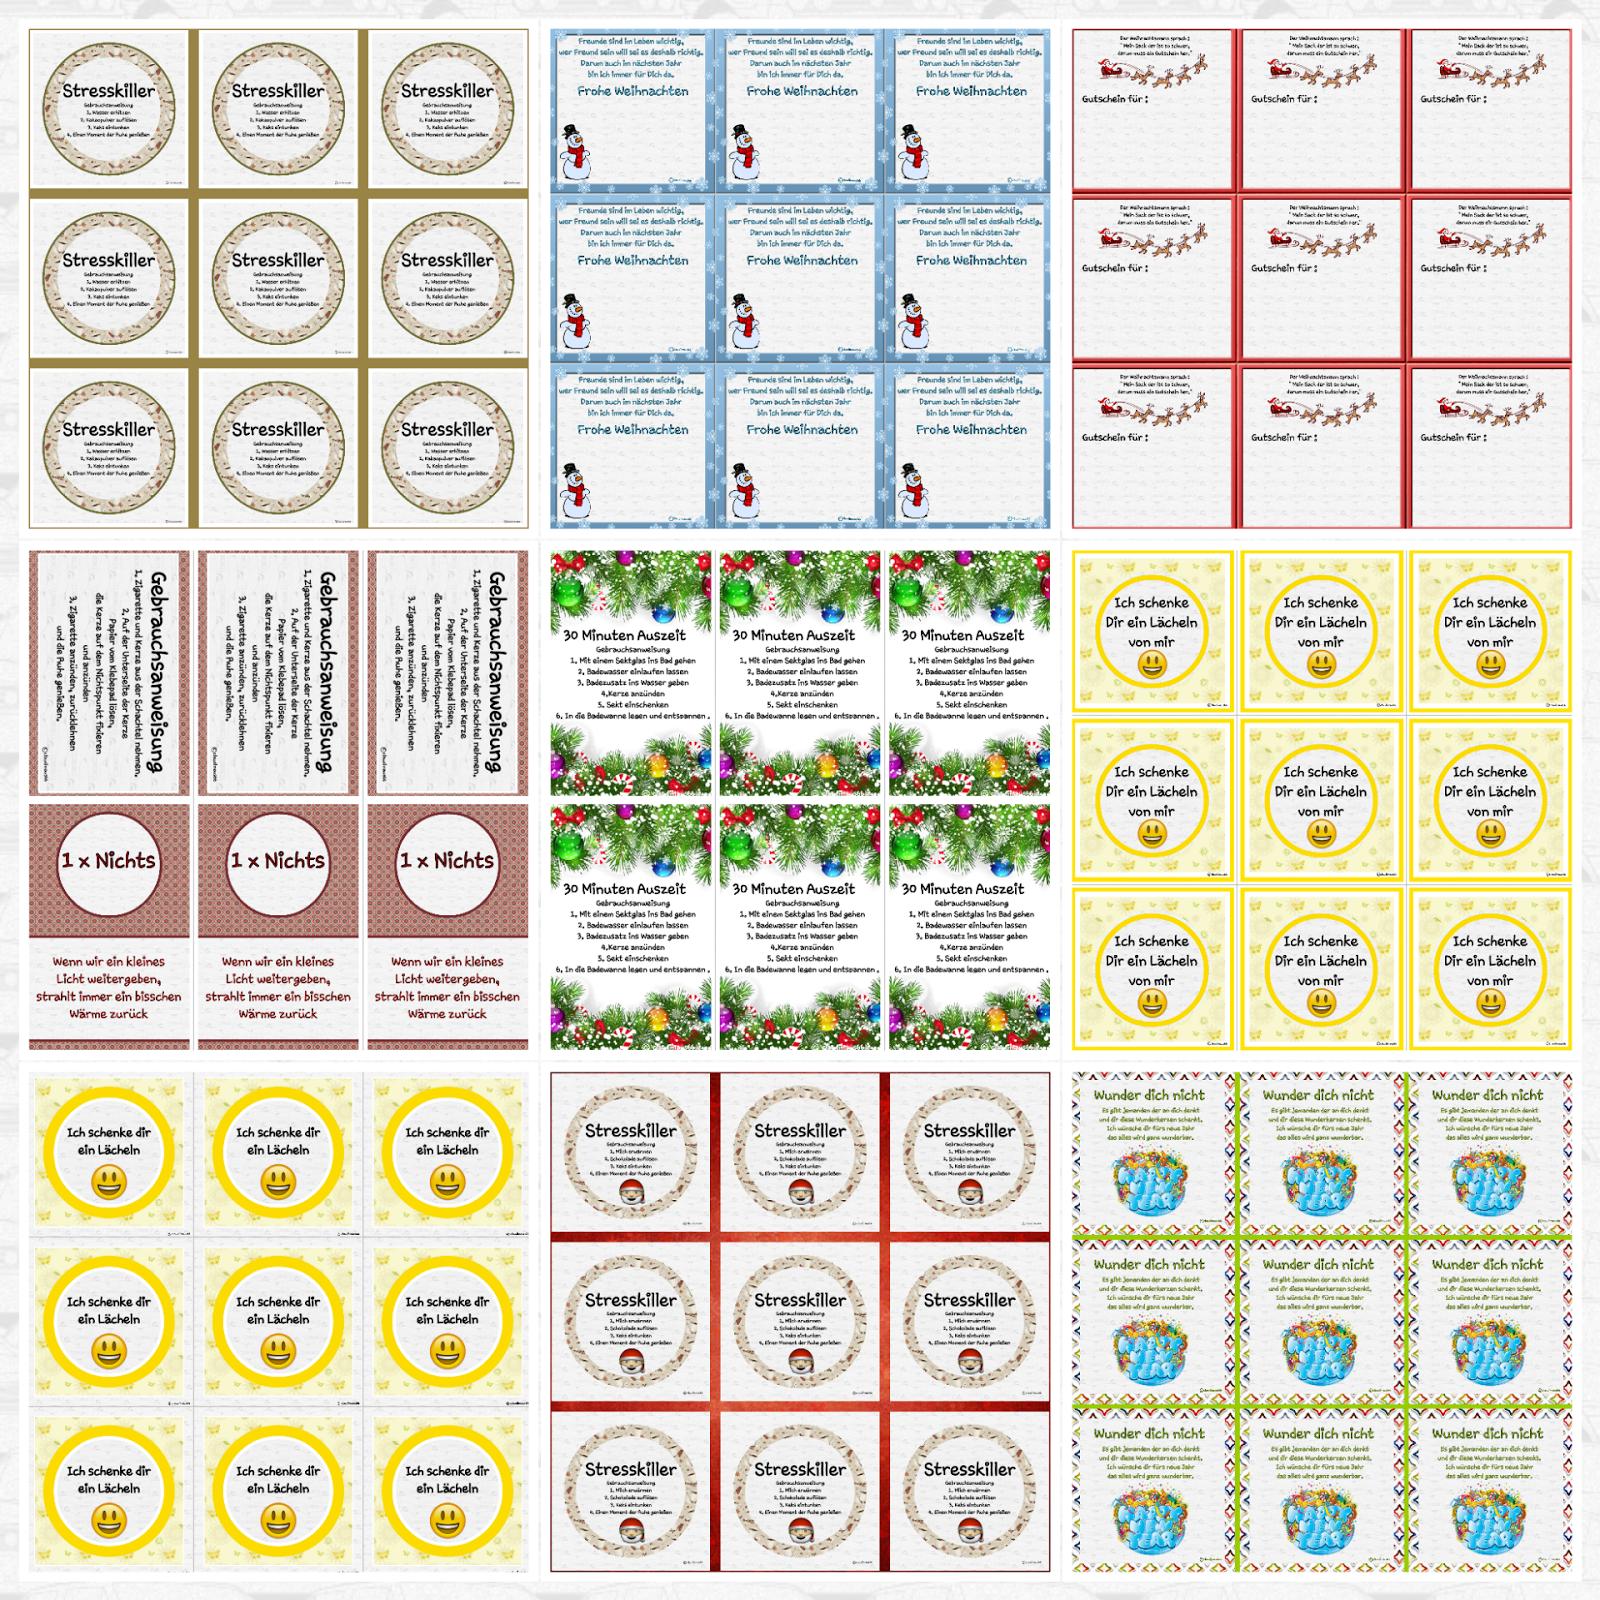 Nett Küche Etikette Fotos - Küchen Ideen Modern - thelostwaysreview.info